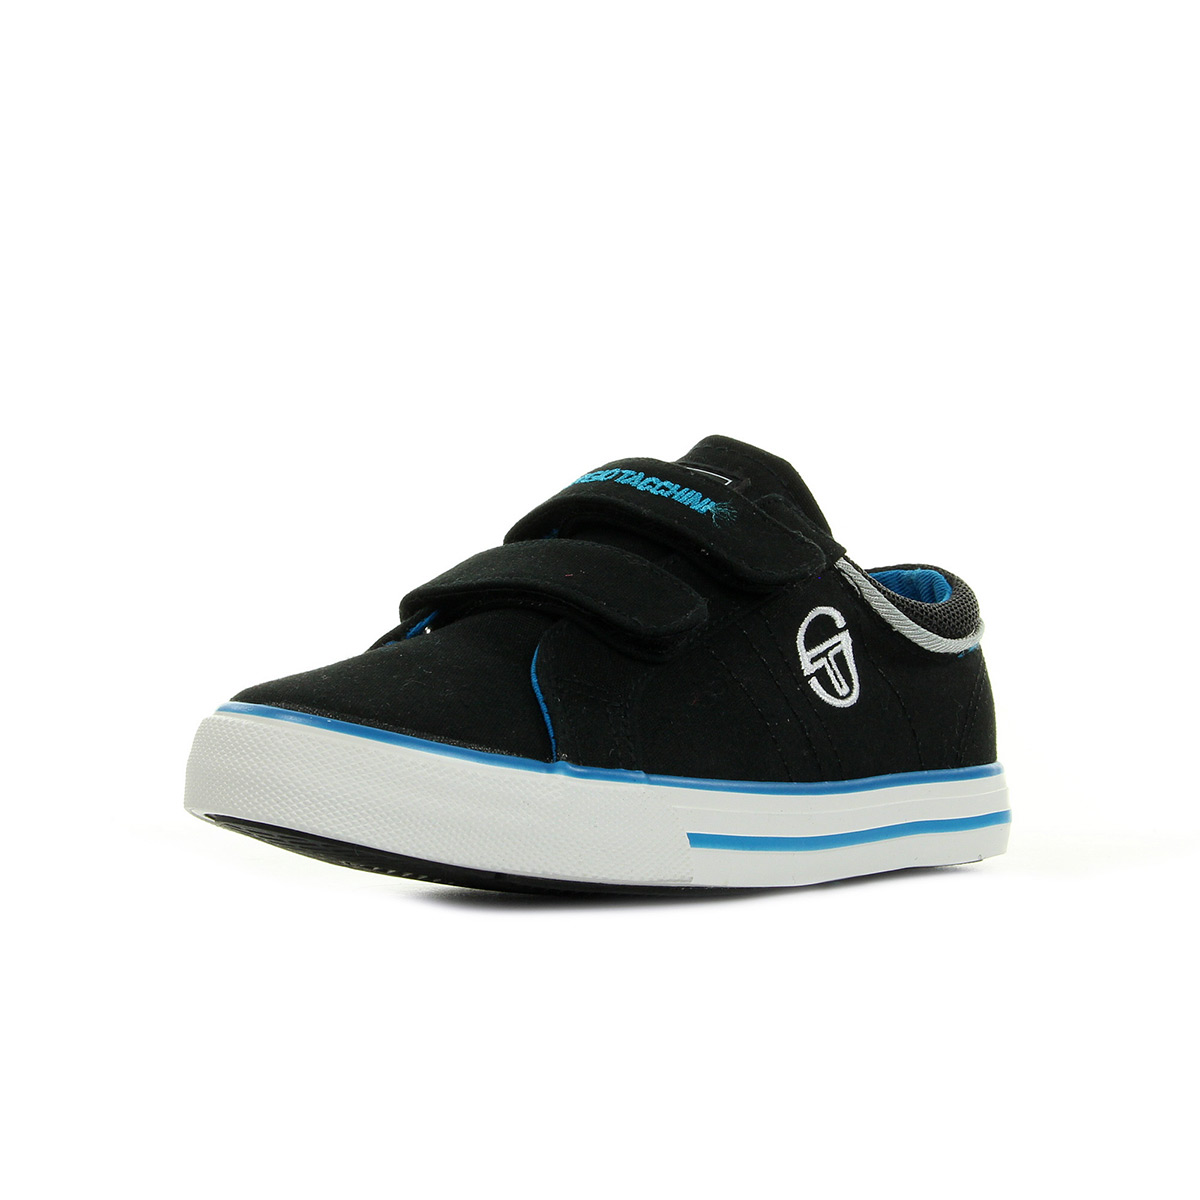 sergio tacchini copenhagen cvs st61627501  chaussures